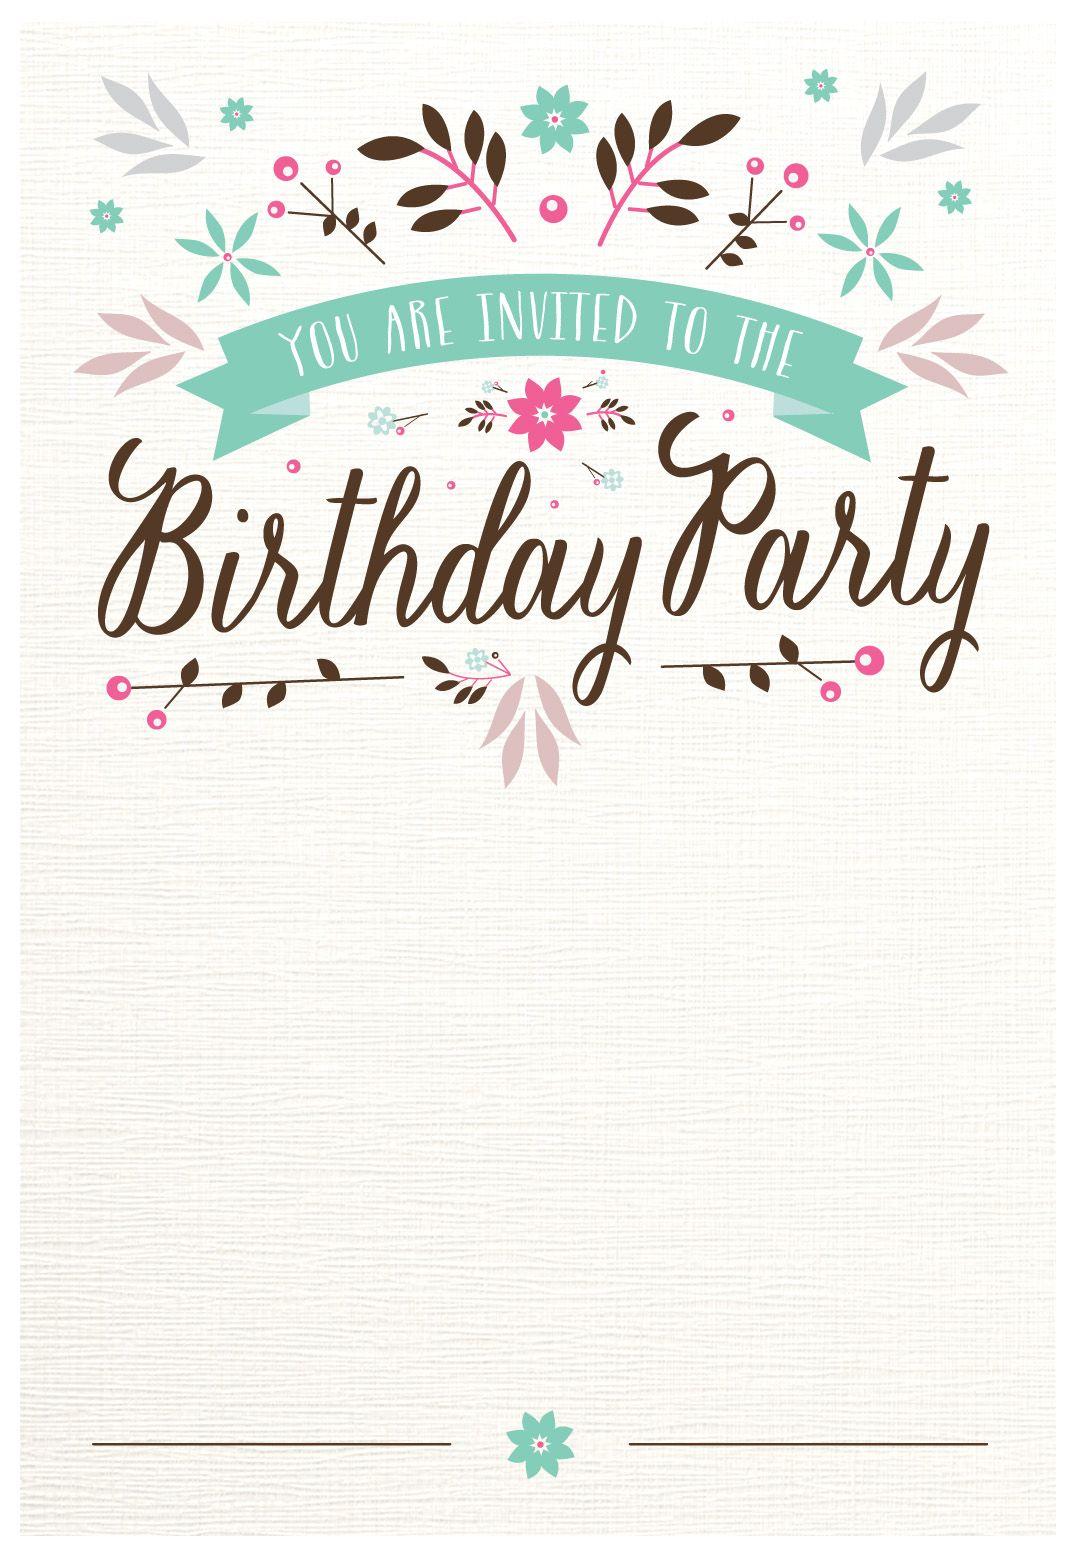 Flat Floral - Free Printable Birthday Invitation Template - Free Printable Birthday Invitations